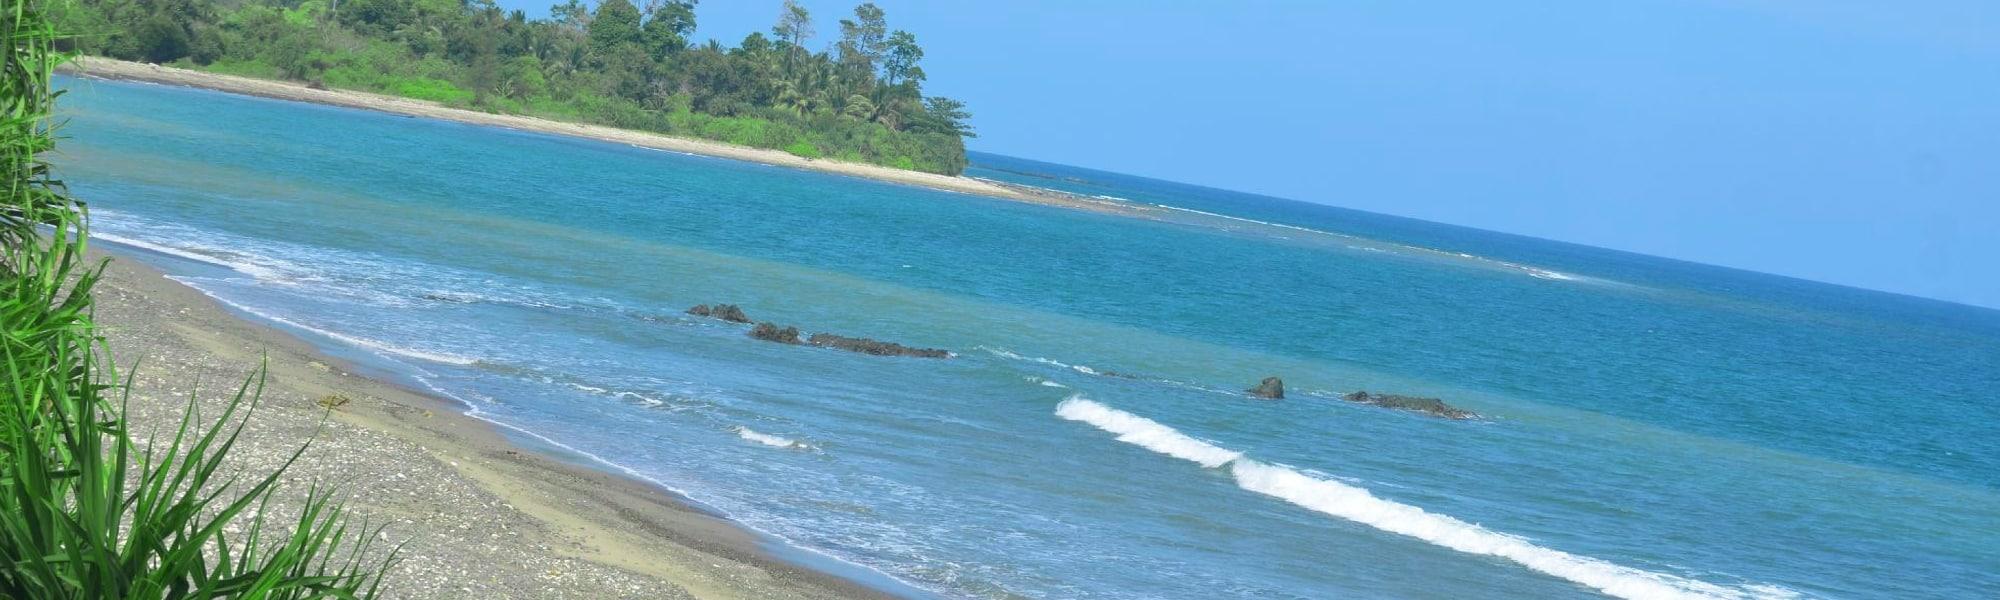 Aamkunj Beach